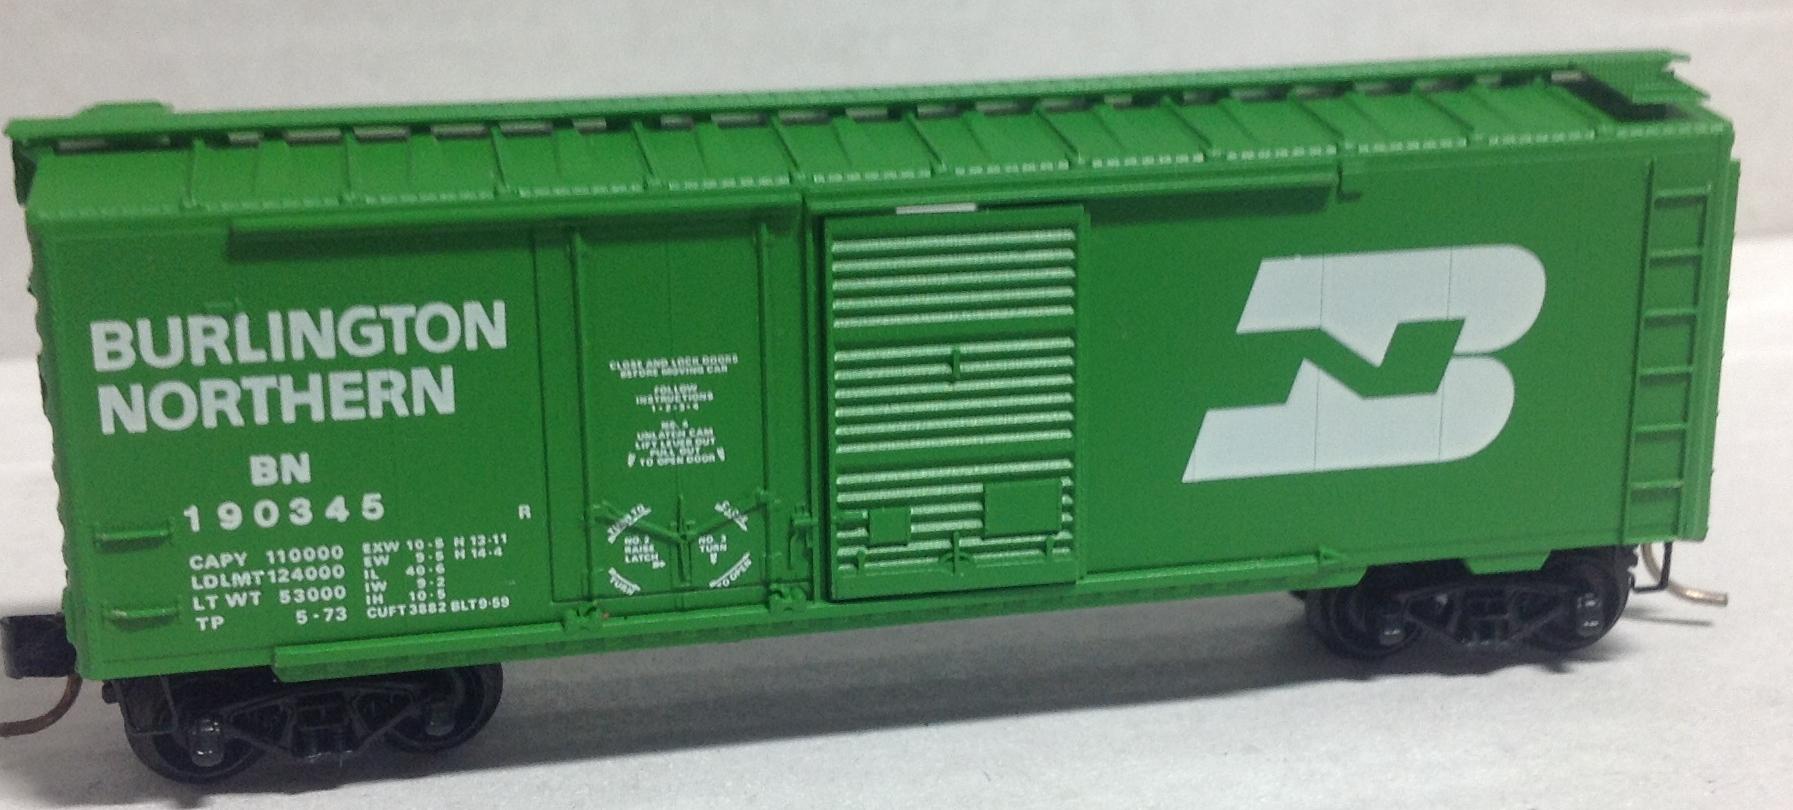 N Scale - Micro-Trains - 22010 - Boxcar, 40 Foot, Steel Combo Door - Burlington Northern - 190345